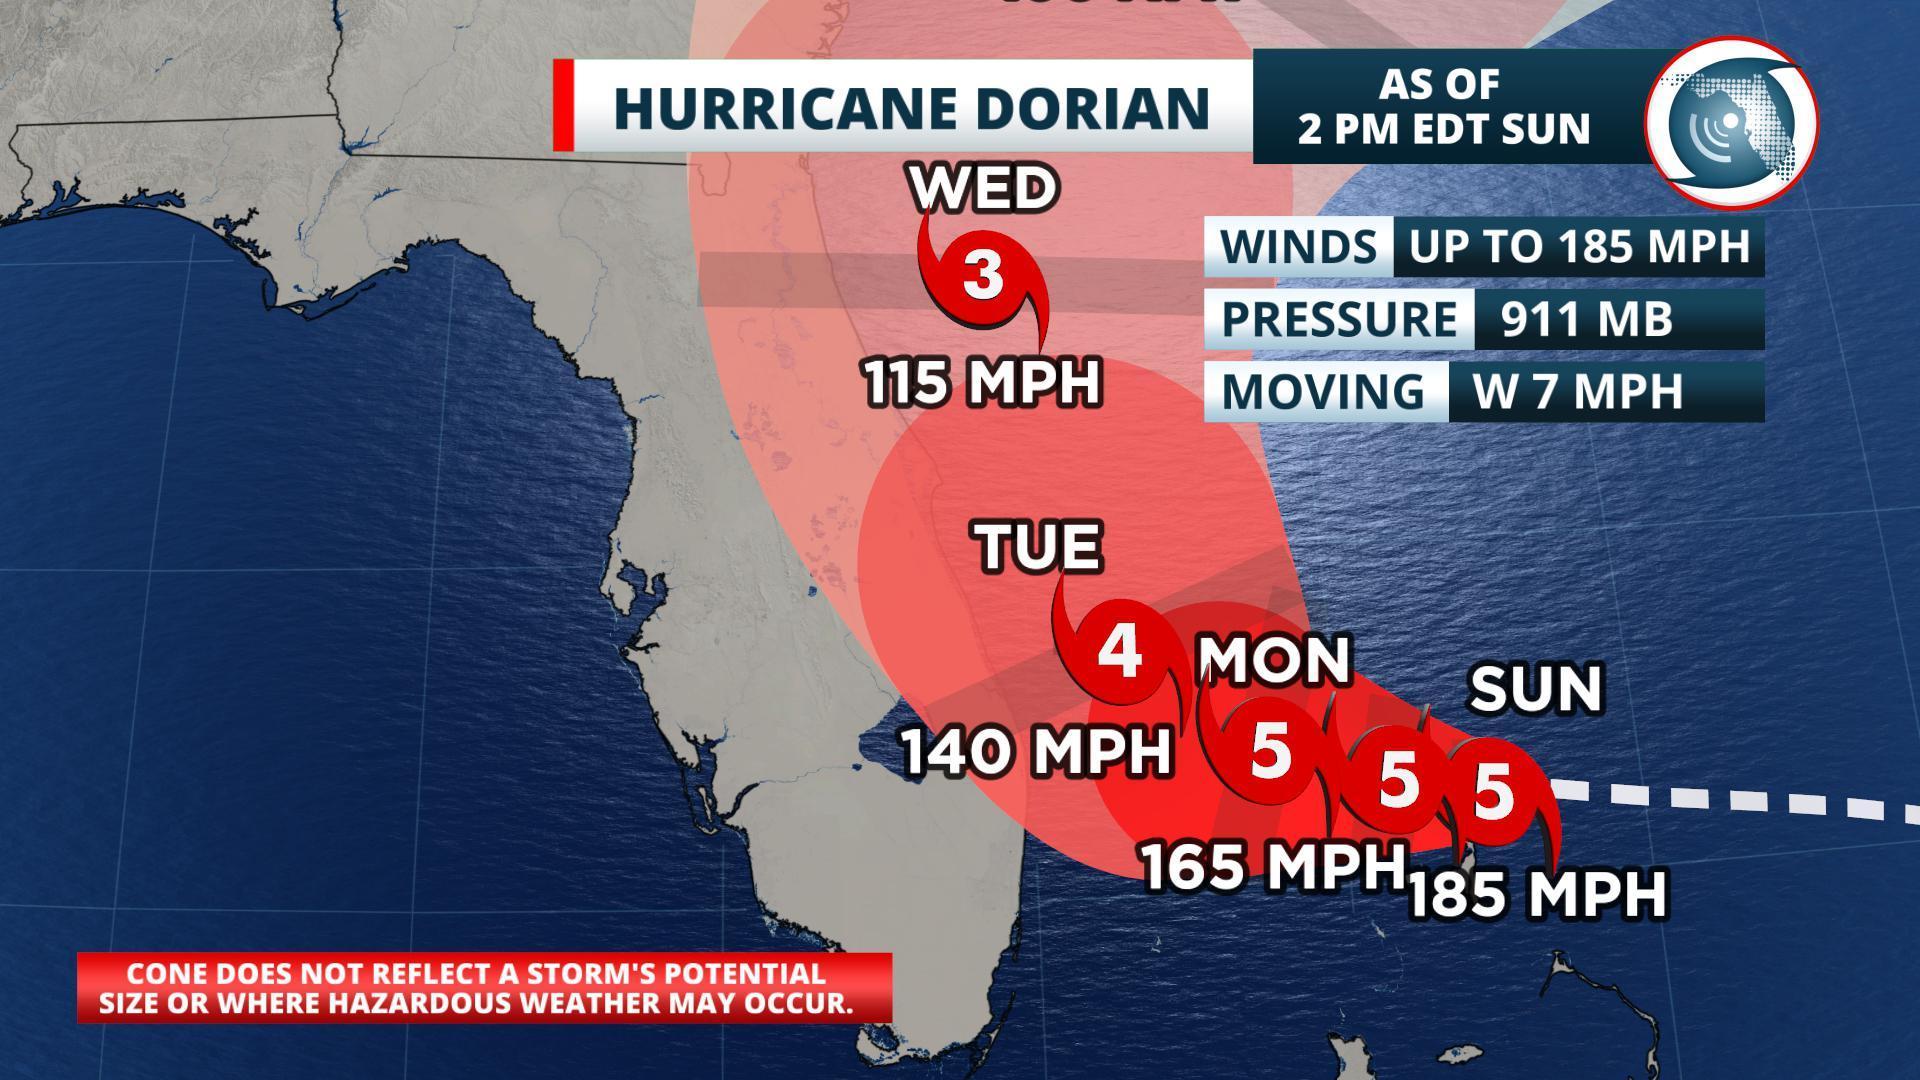 Hurricane Dorian 2PM Update Treasure Coast under a Hurricane